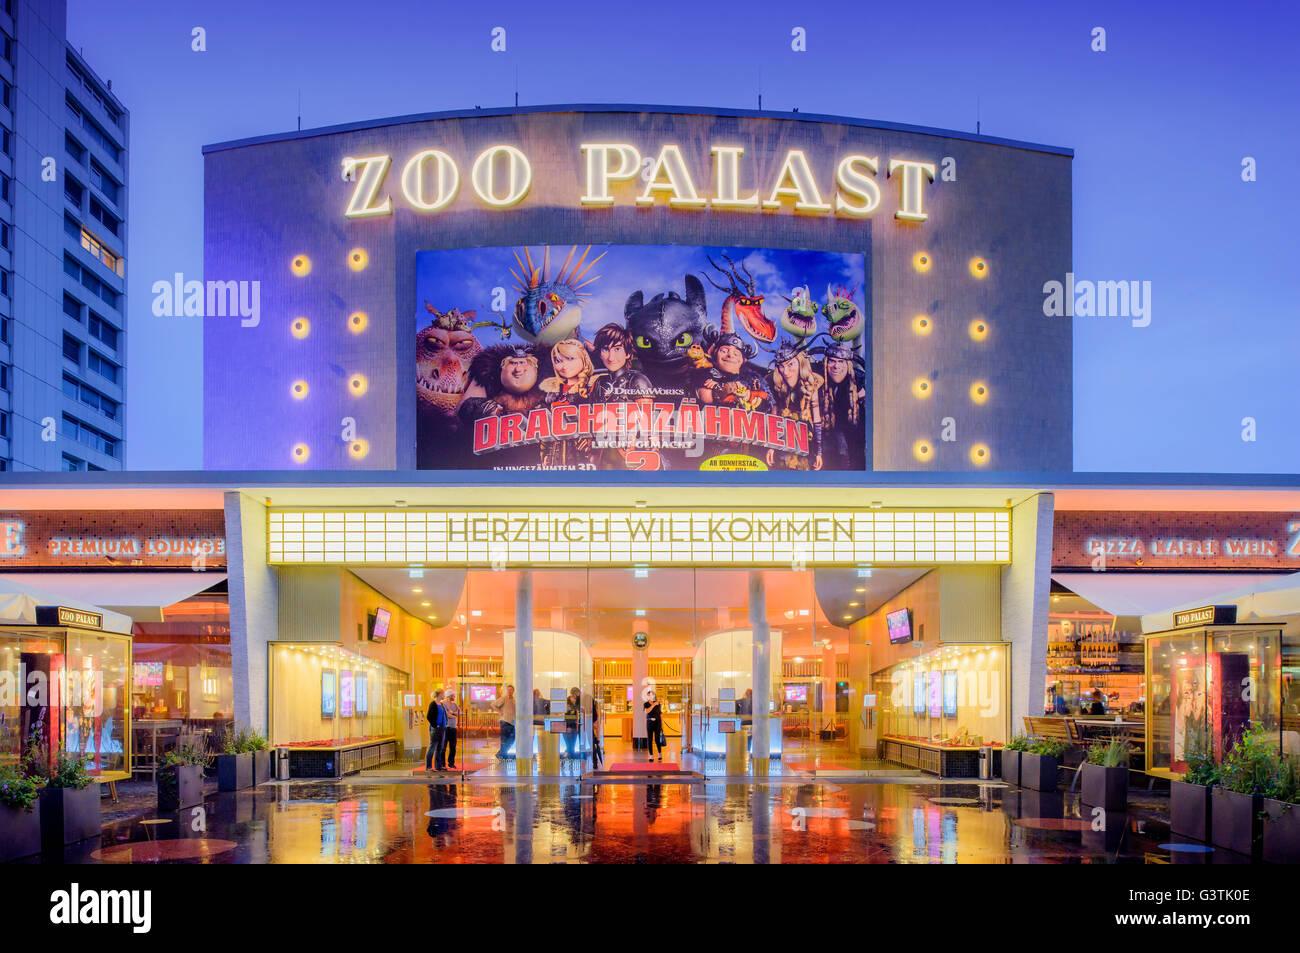 zoo palast stockfotos zoo palast bilder alamy. Black Bedroom Furniture Sets. Home Design Ideas